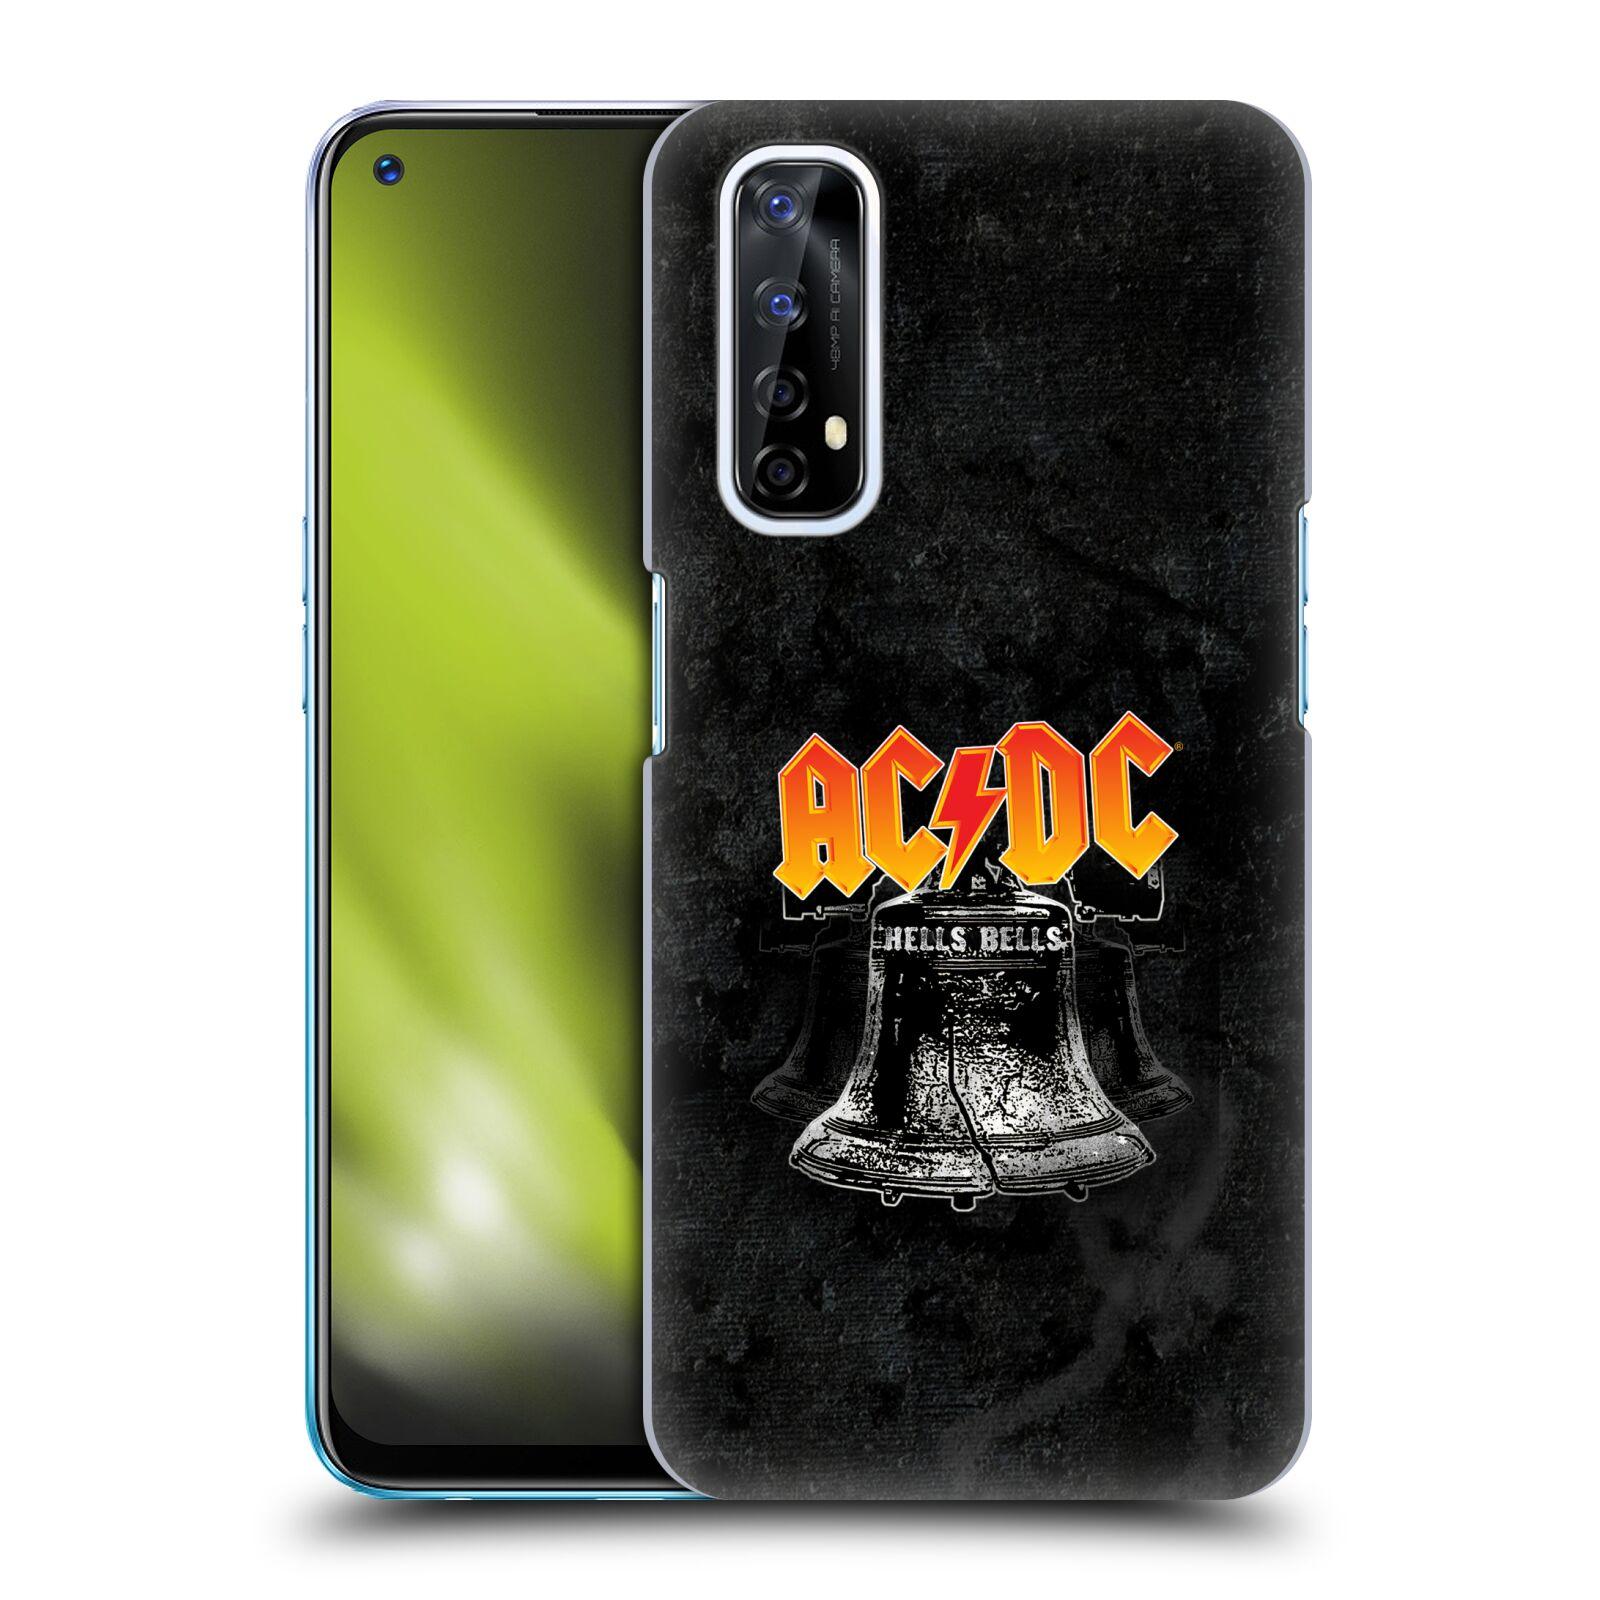 Plastové pouzdro na mobil Realme 7 - Head Case - AC/DC Hells Bells